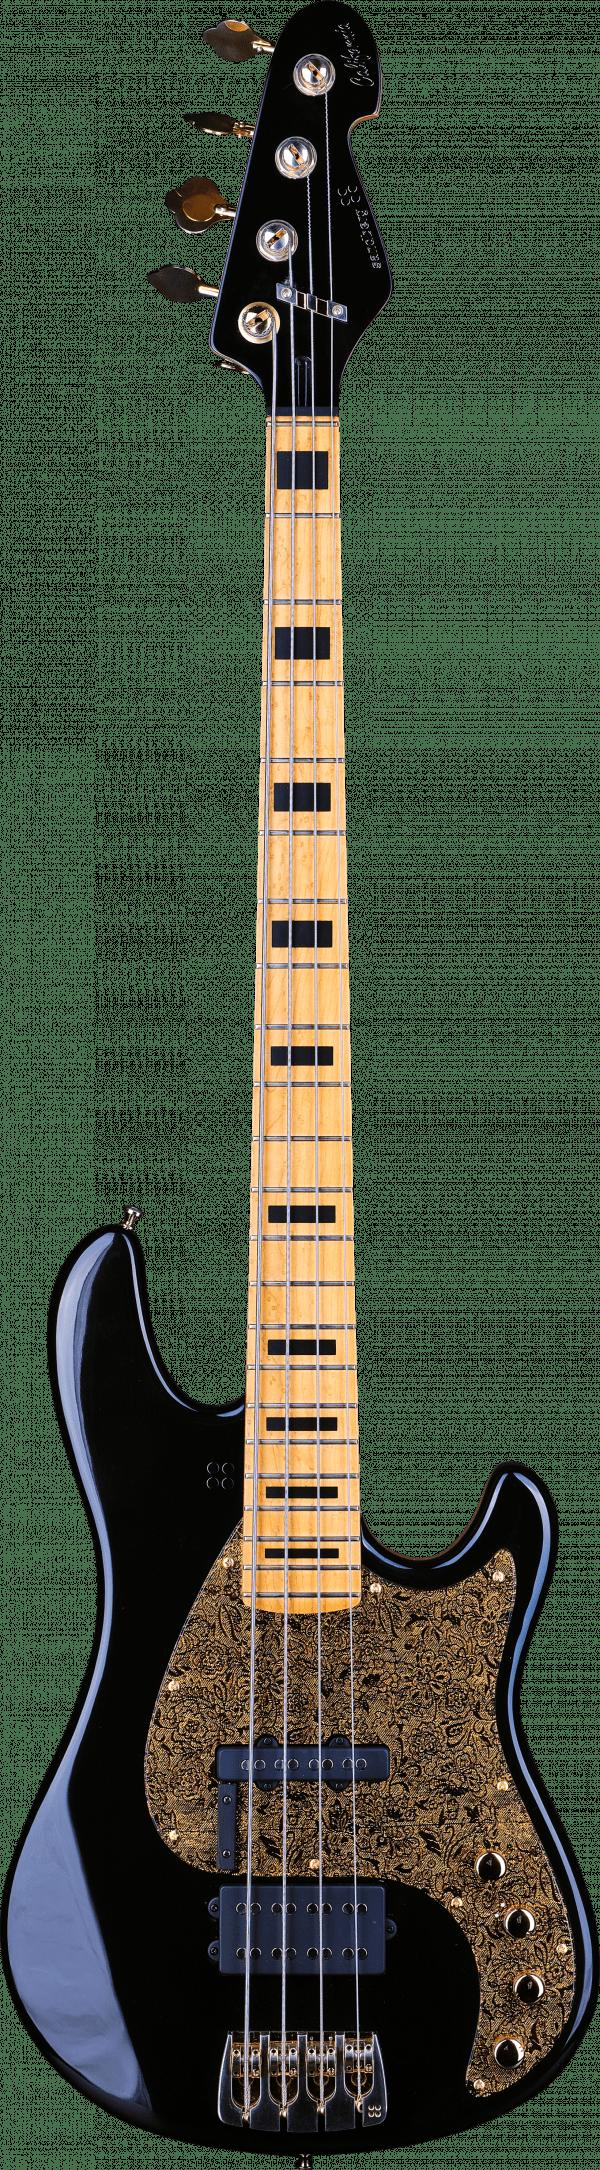 Sandberg California Ida Nielsen Signature Bass (B-stock)